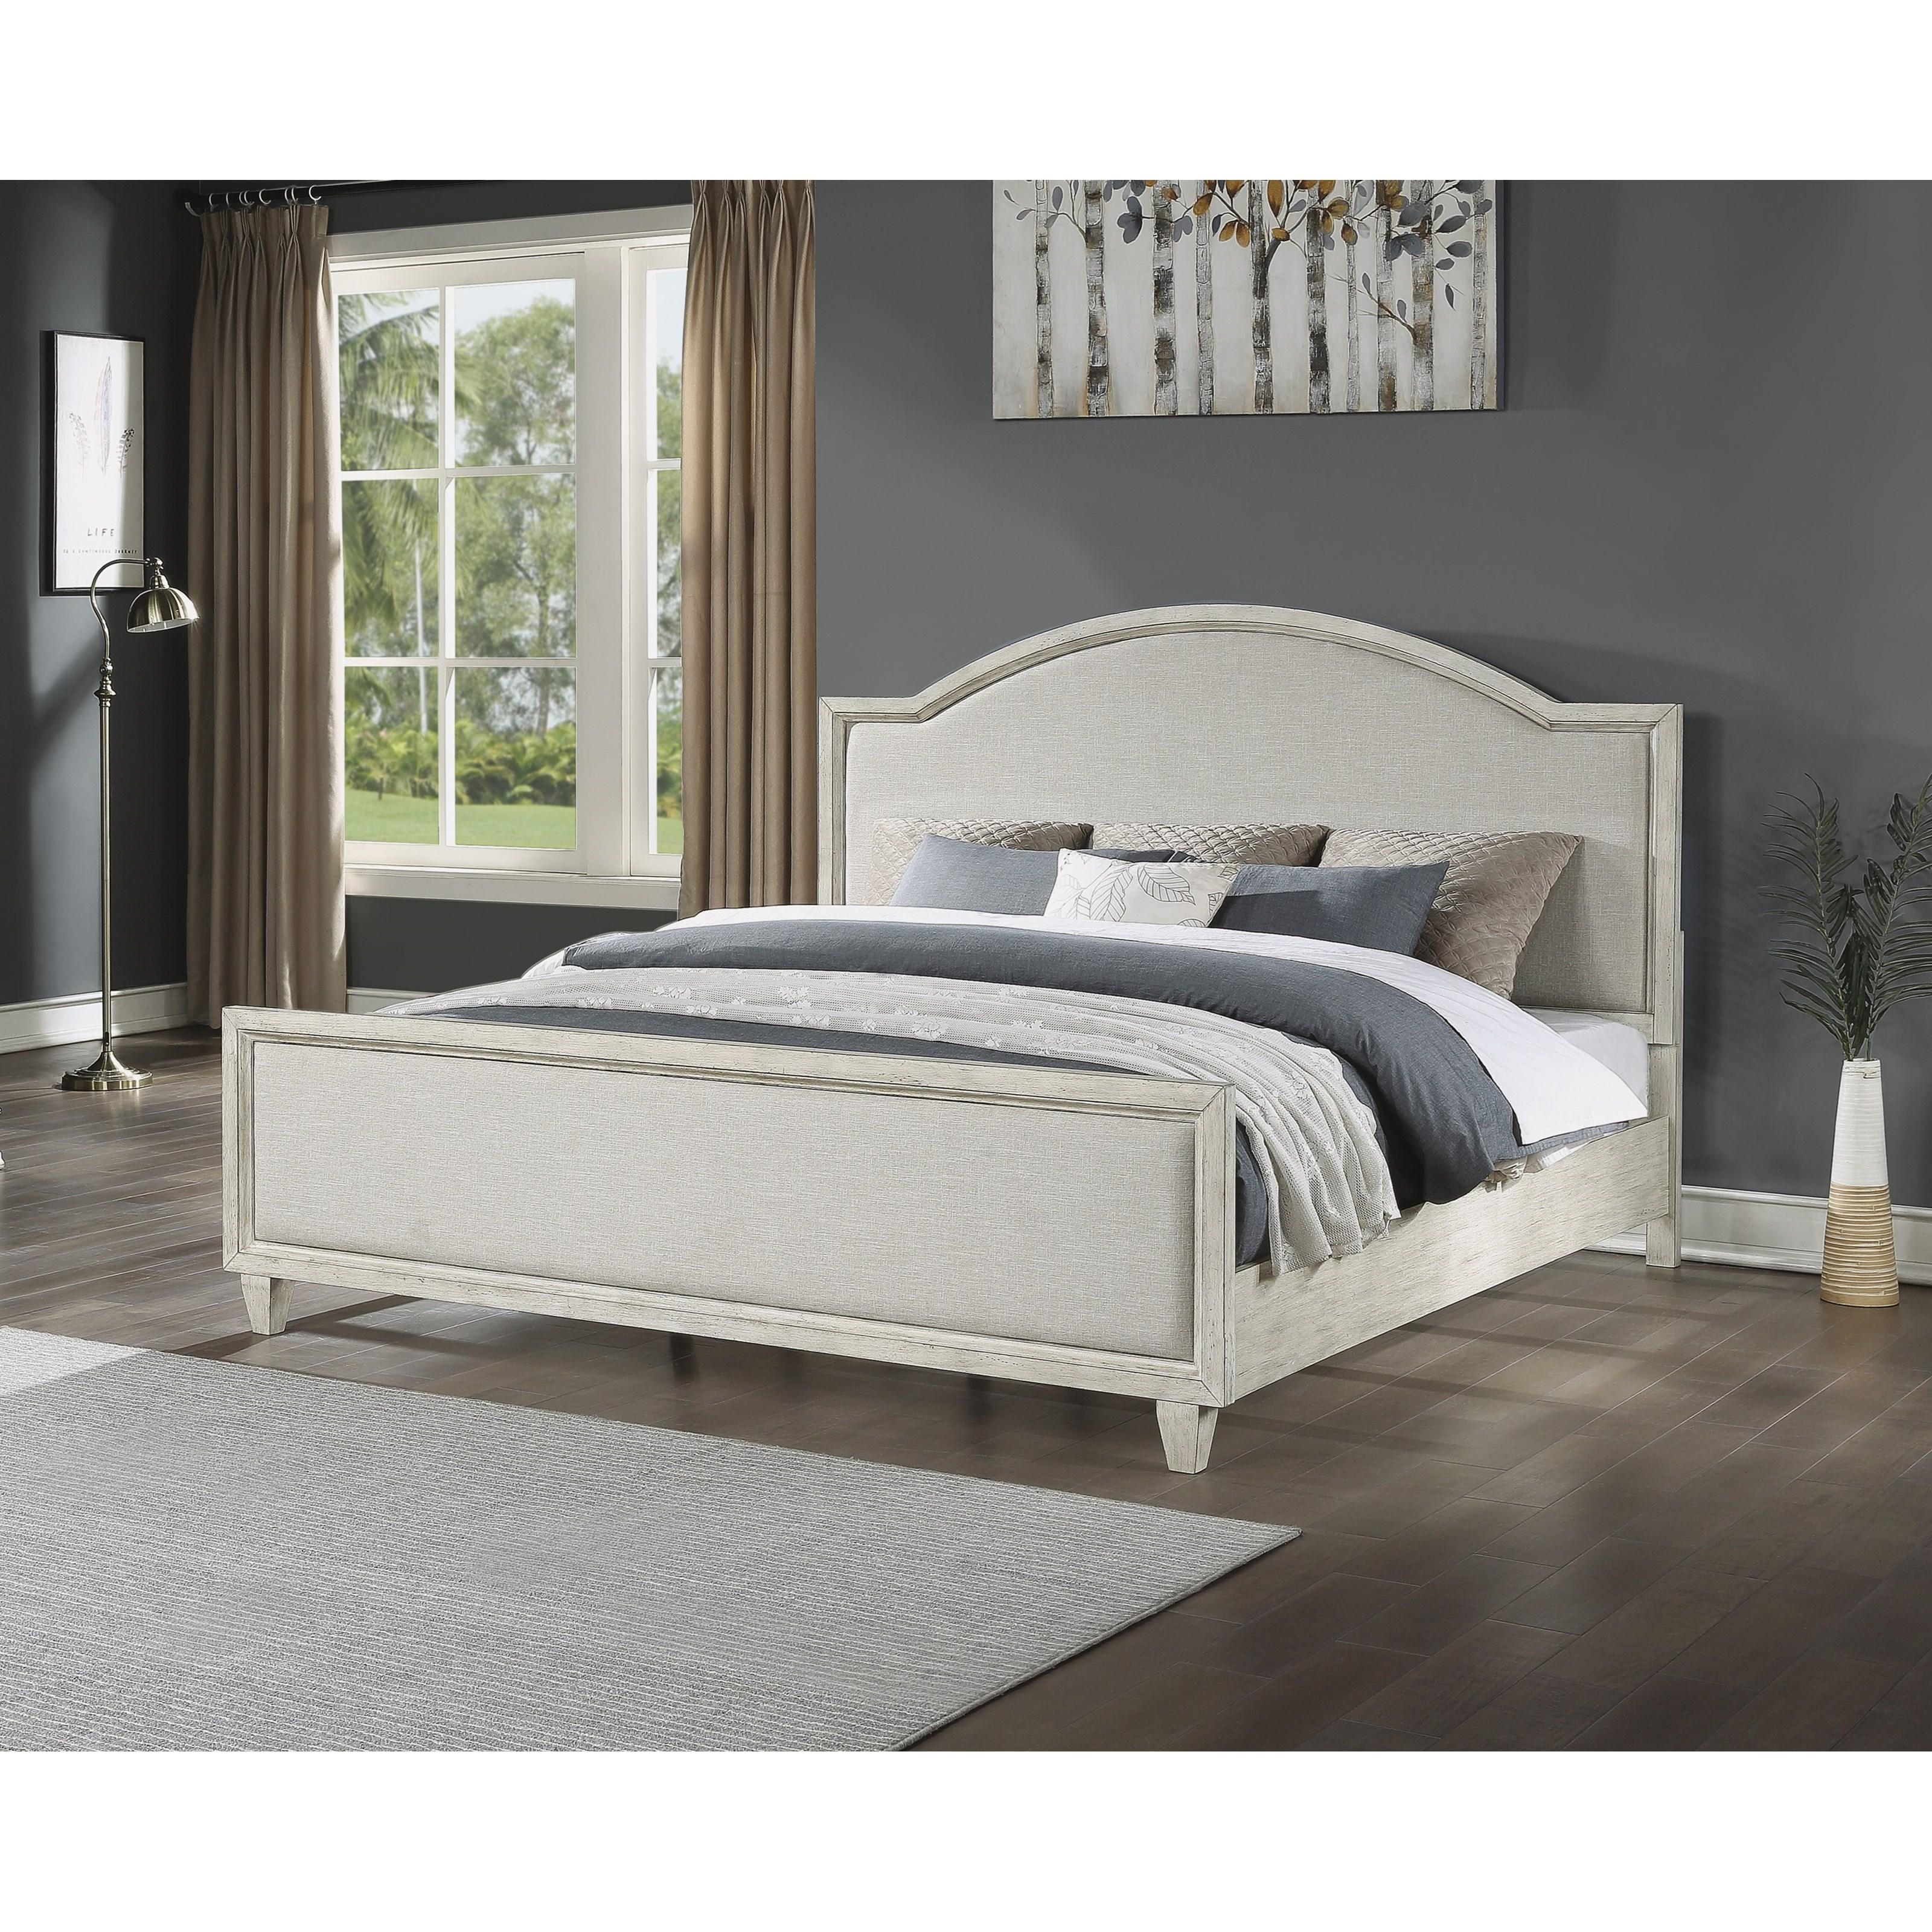 Gladys King Upholstered Bed